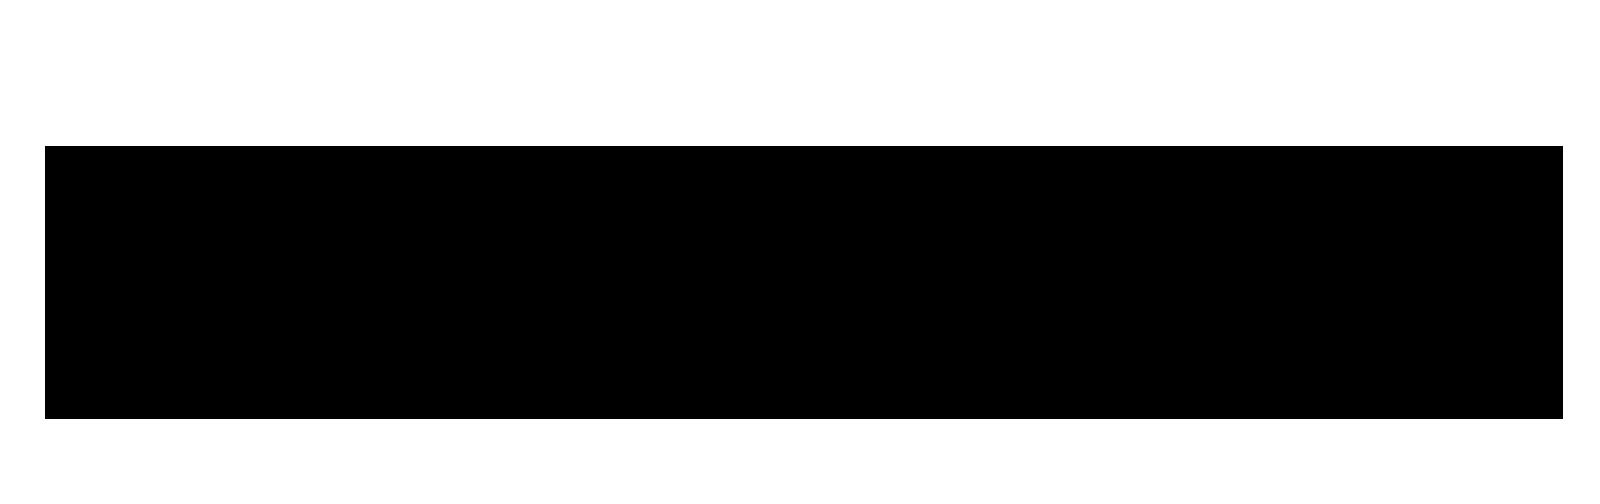 mivibeta list 2 negro (2)